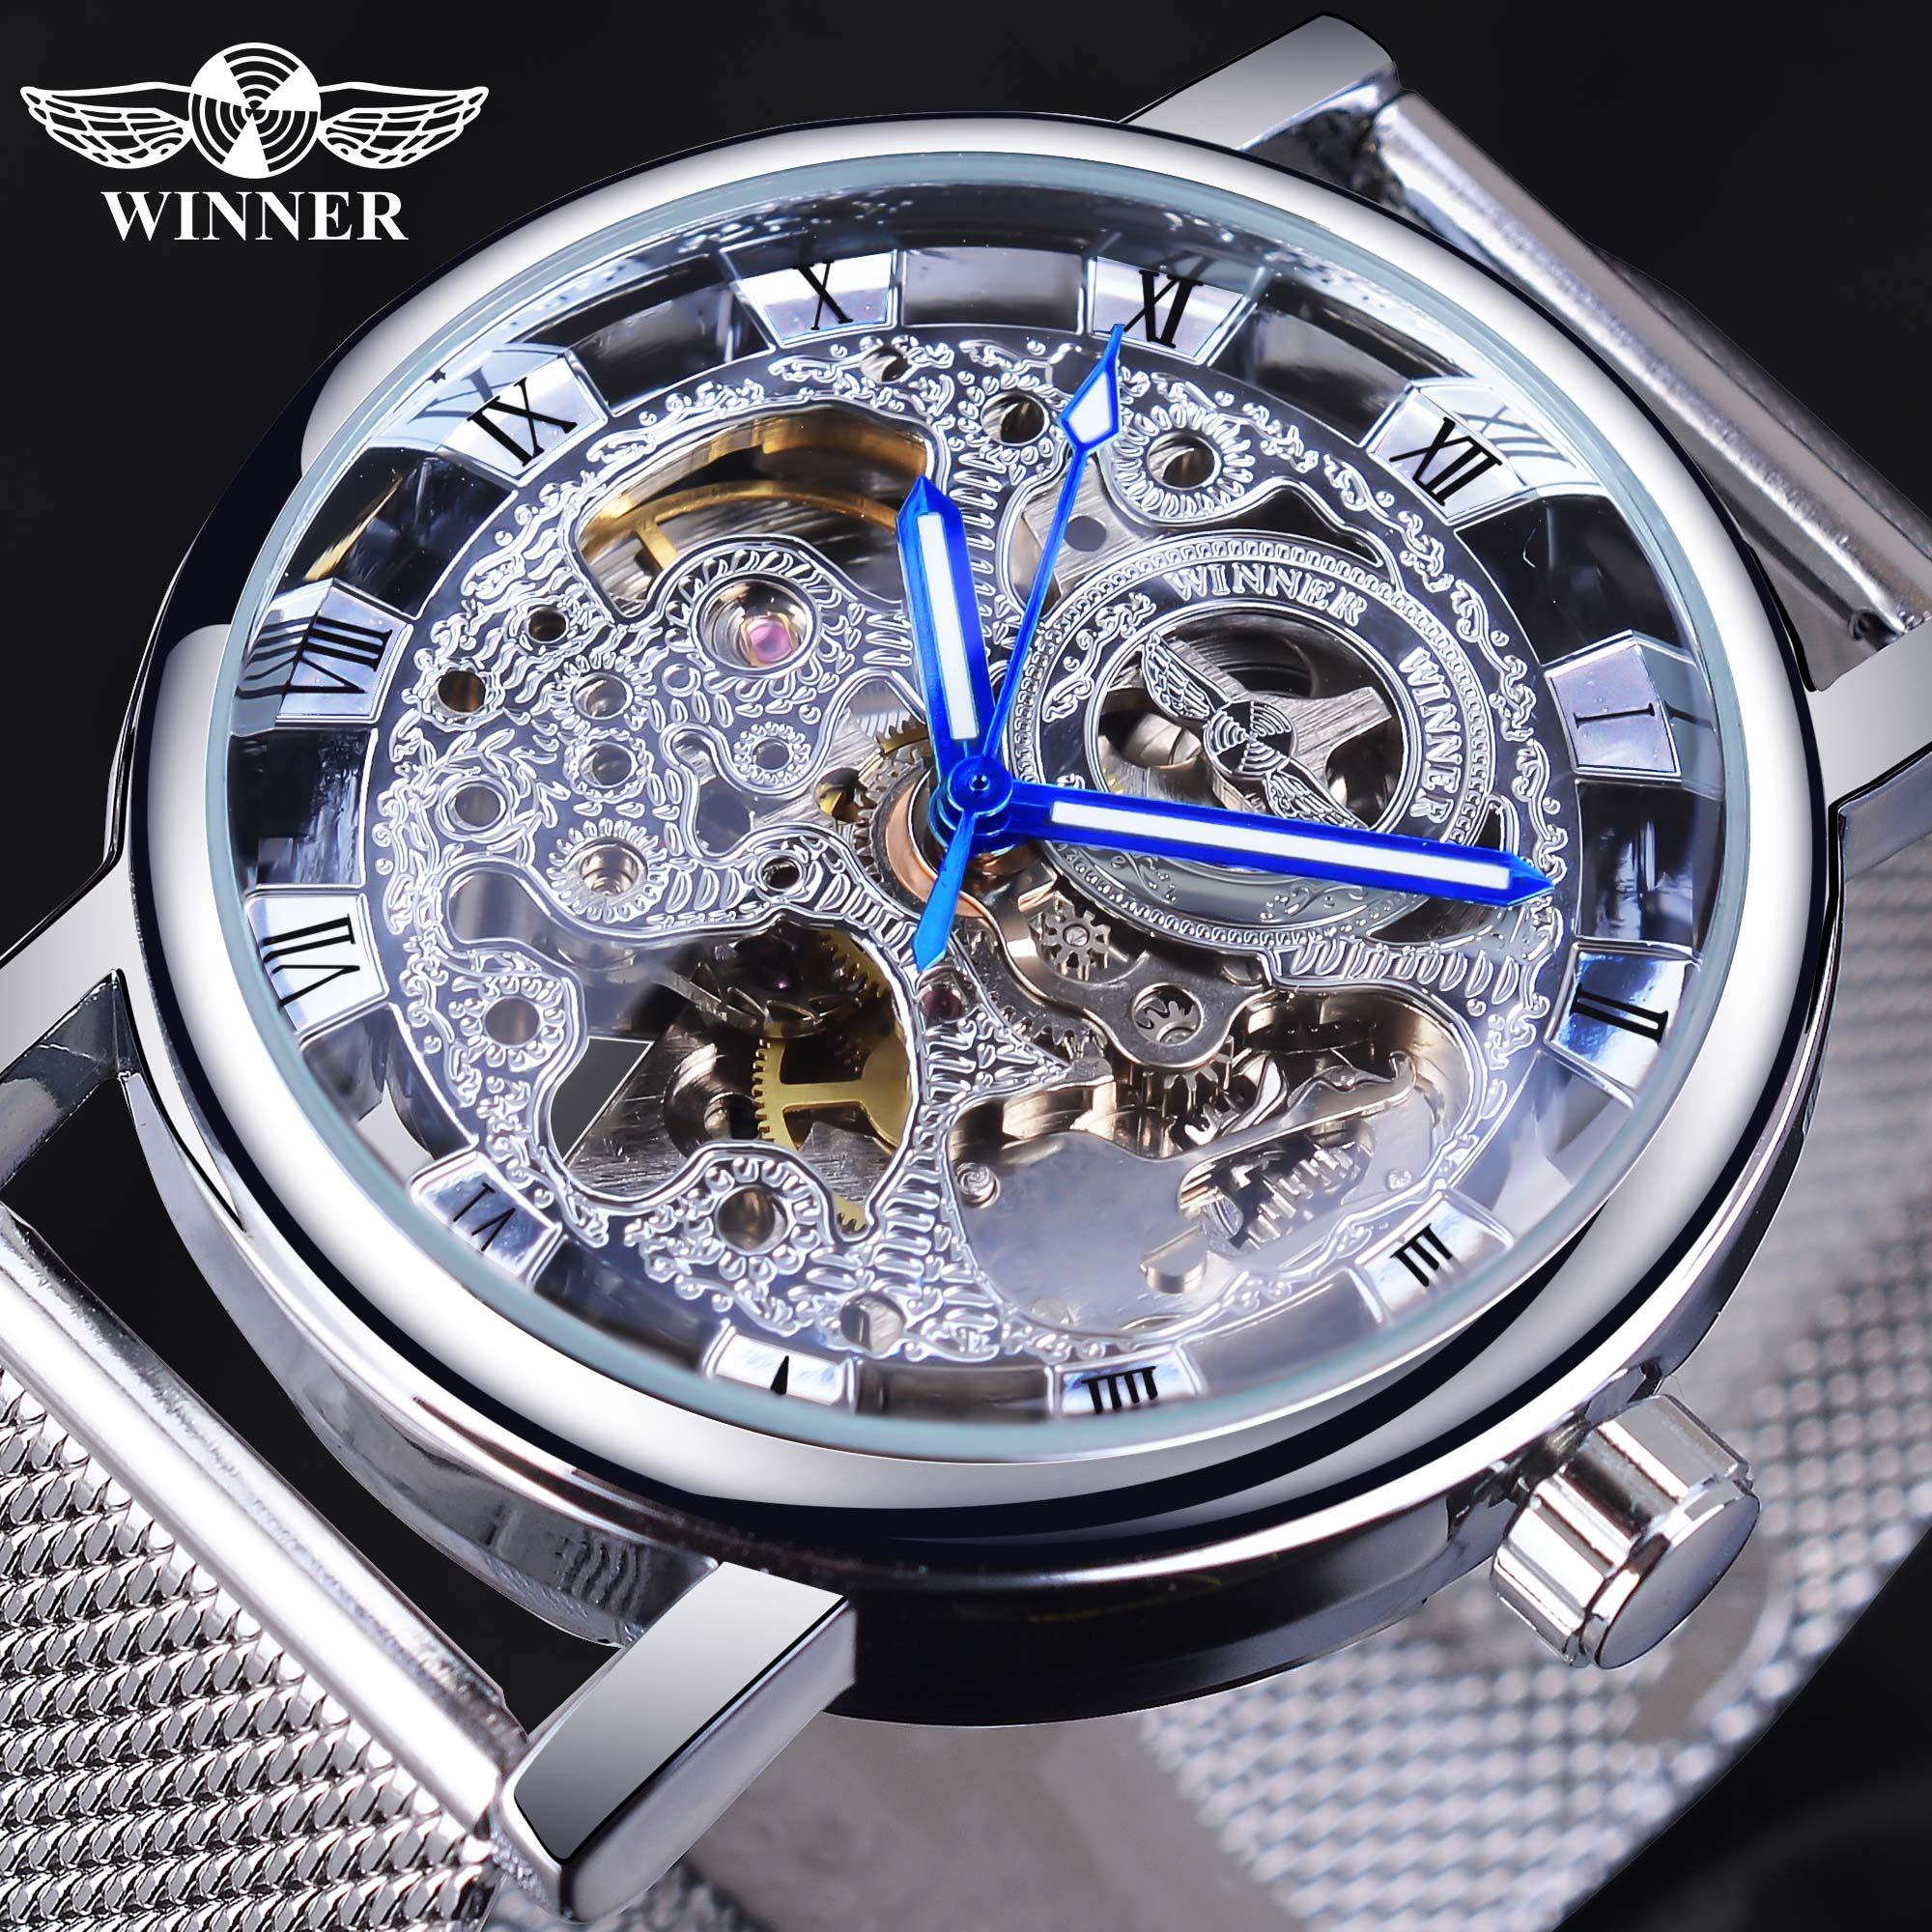 Winner Roman Analog Silver Skeleton Dial Watch Top Brand Luxury Automatic Mechanical Sport Watch Luminous Hand Mesh Band Clock